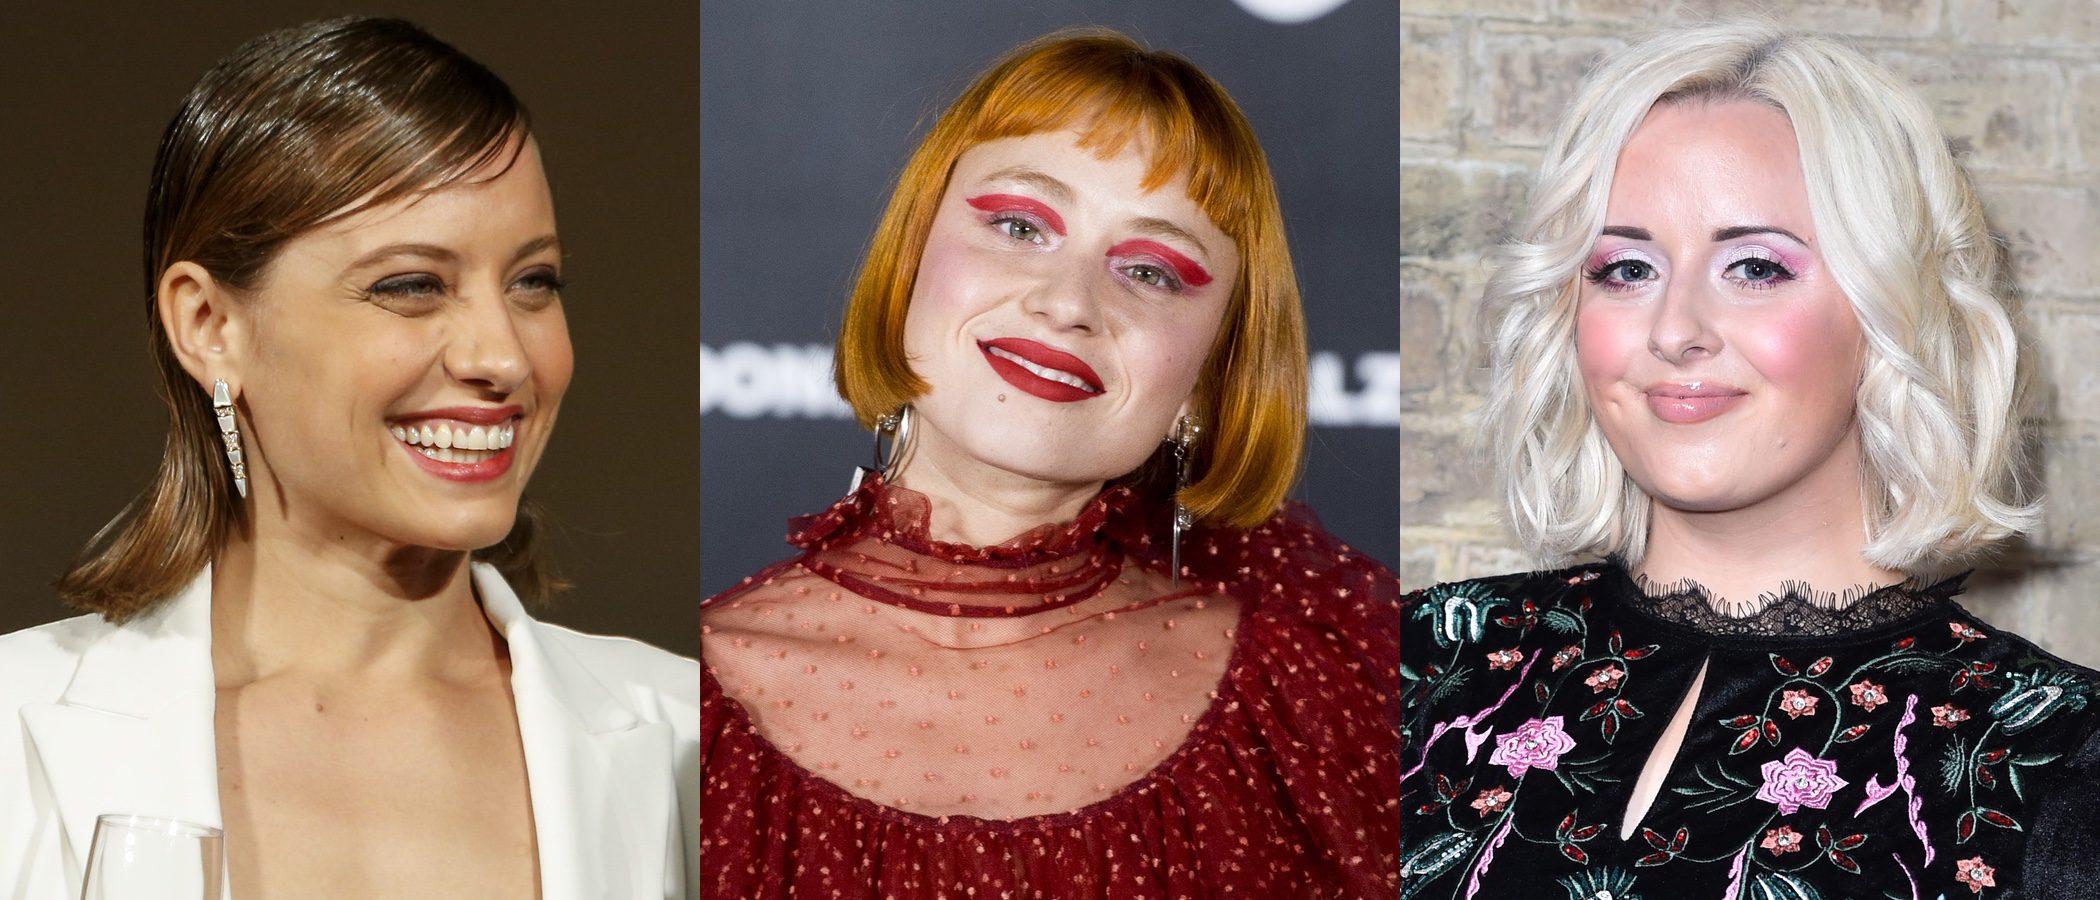 Kathie Thistleton, Miranda Makaroff y Michelle Jenner lucen los peores beauty looks de esta semana